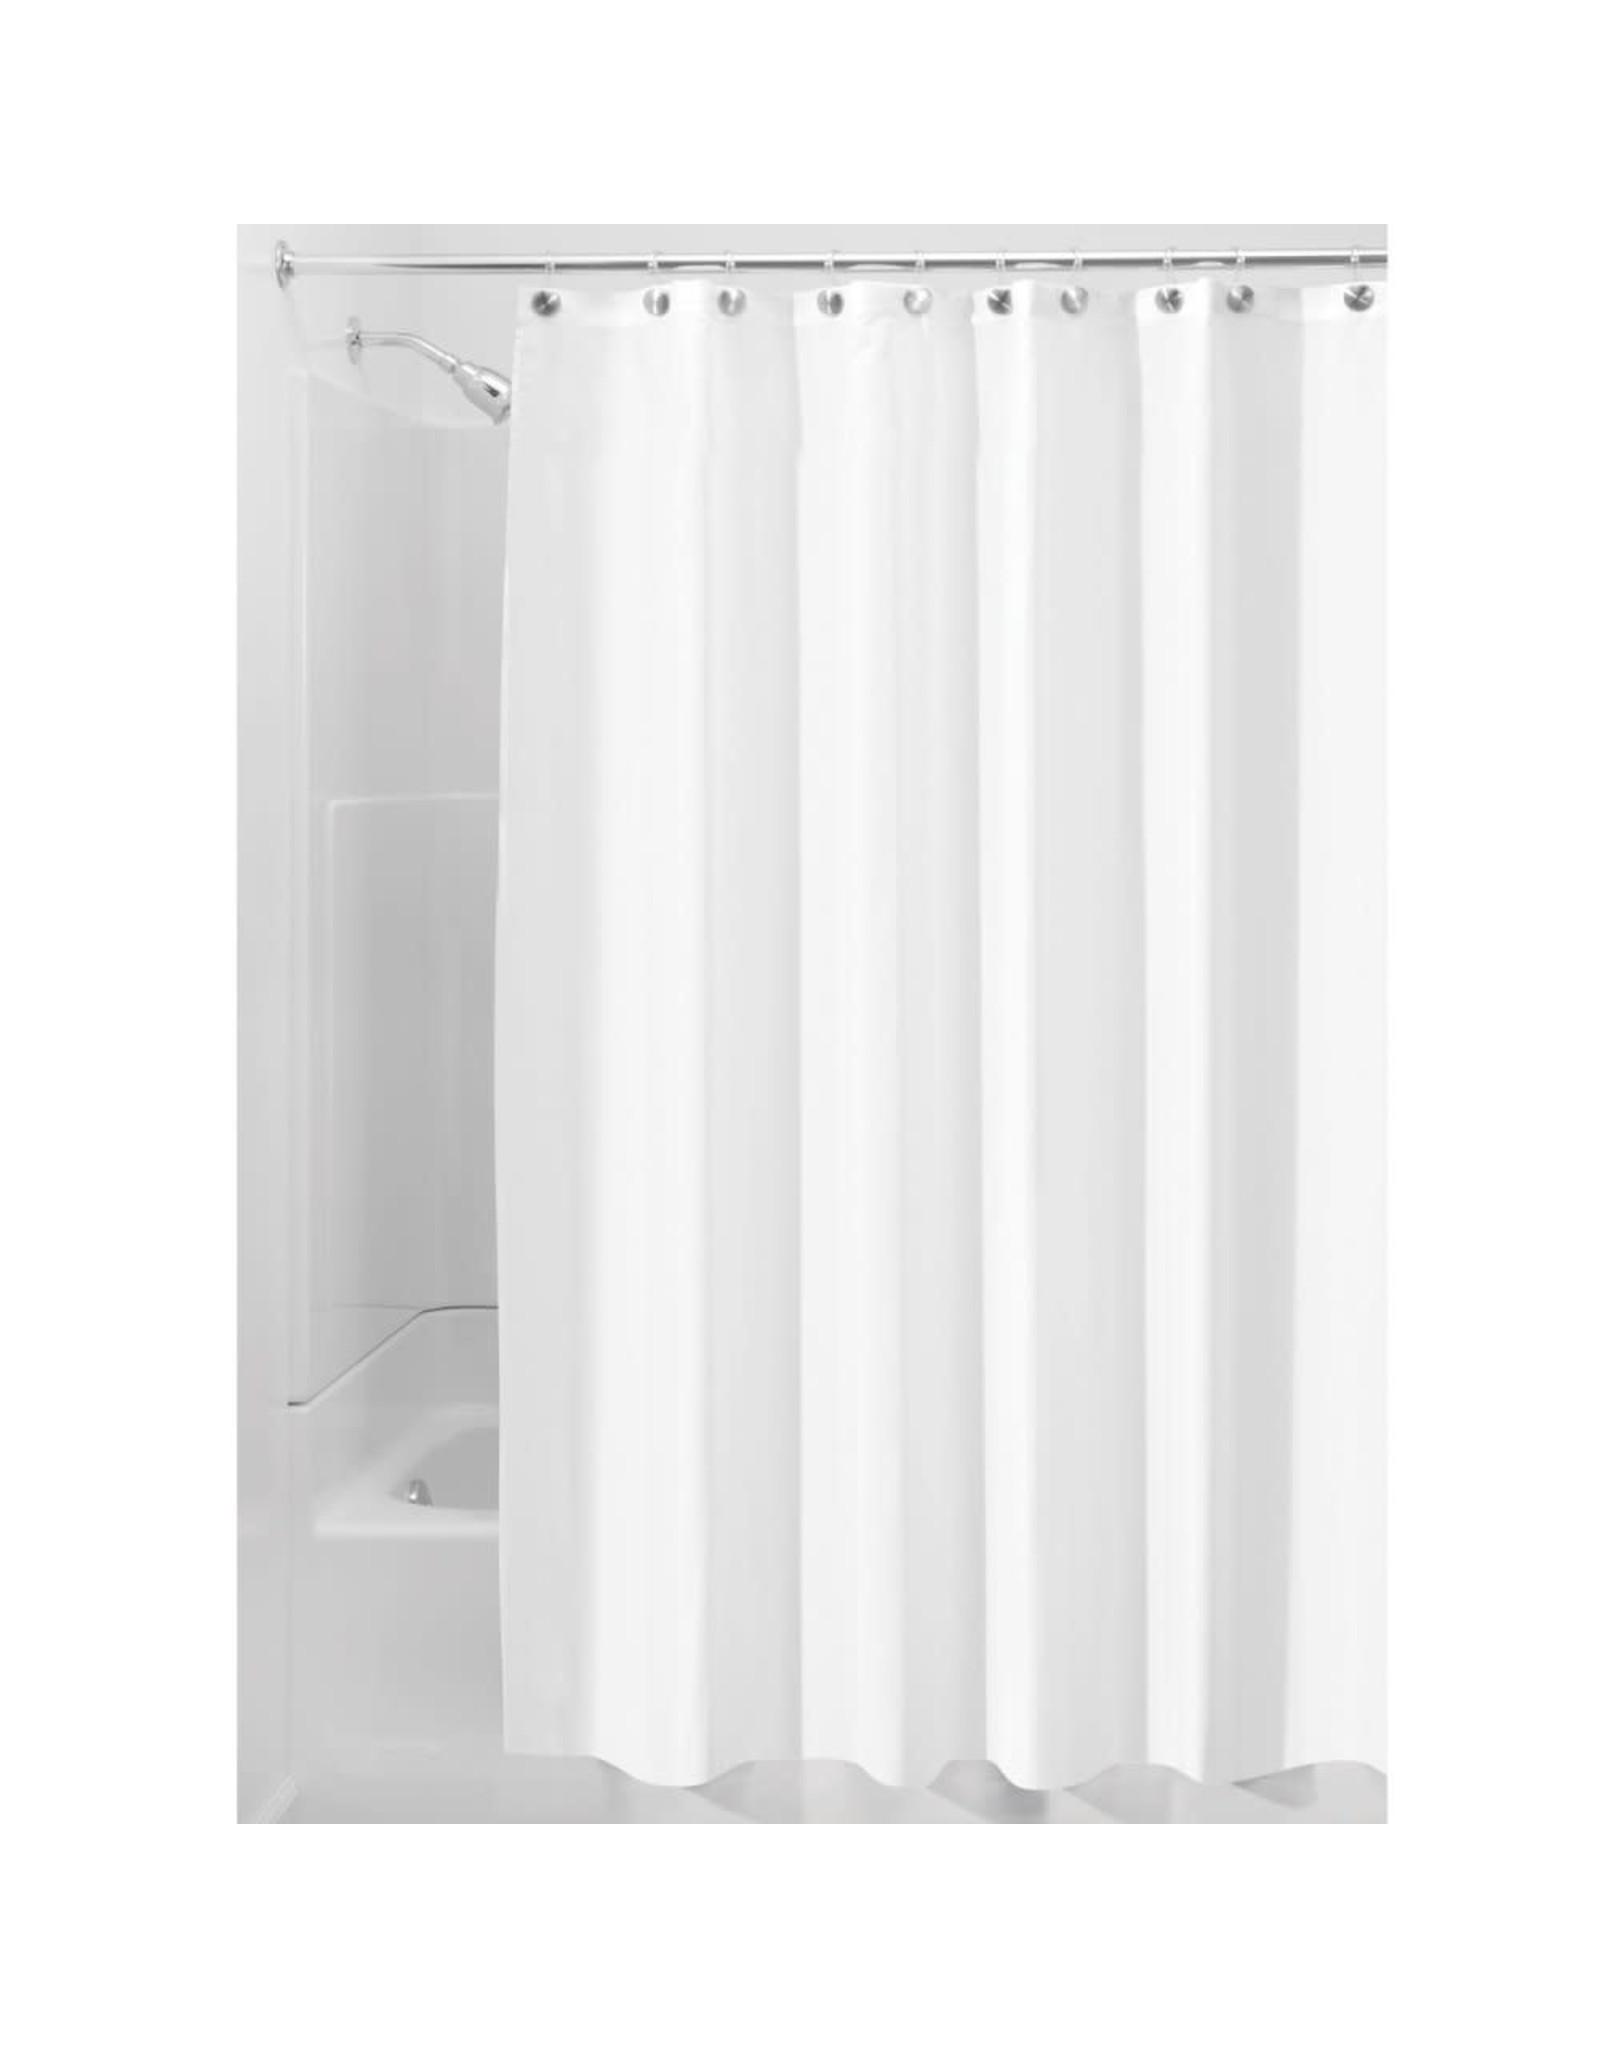 Interdesign InterDesign Fabric Waterproof Shower Curtain Liner, White